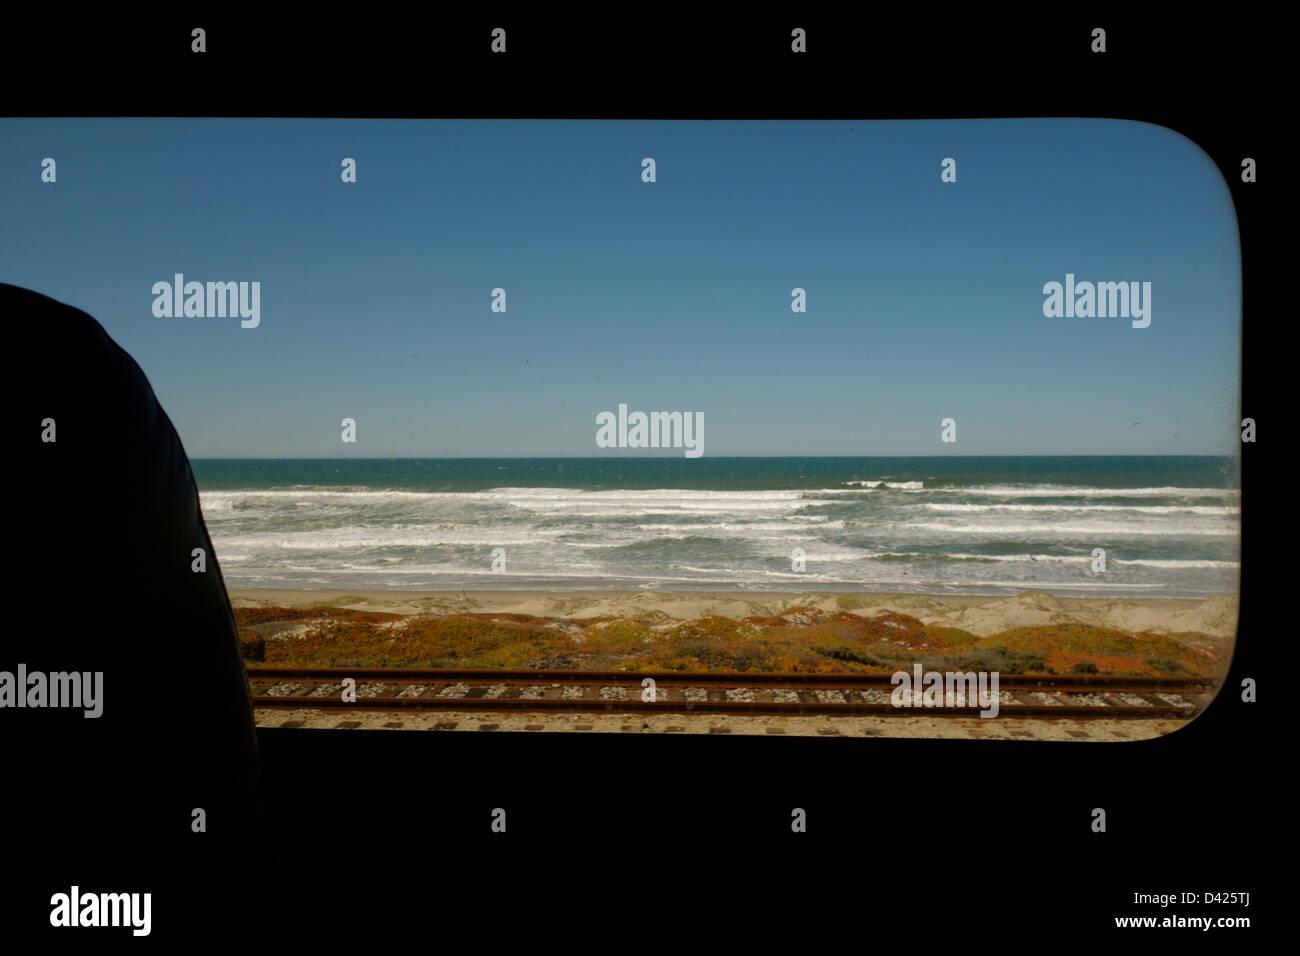 amtrak-train-ocean-view-california-D425T